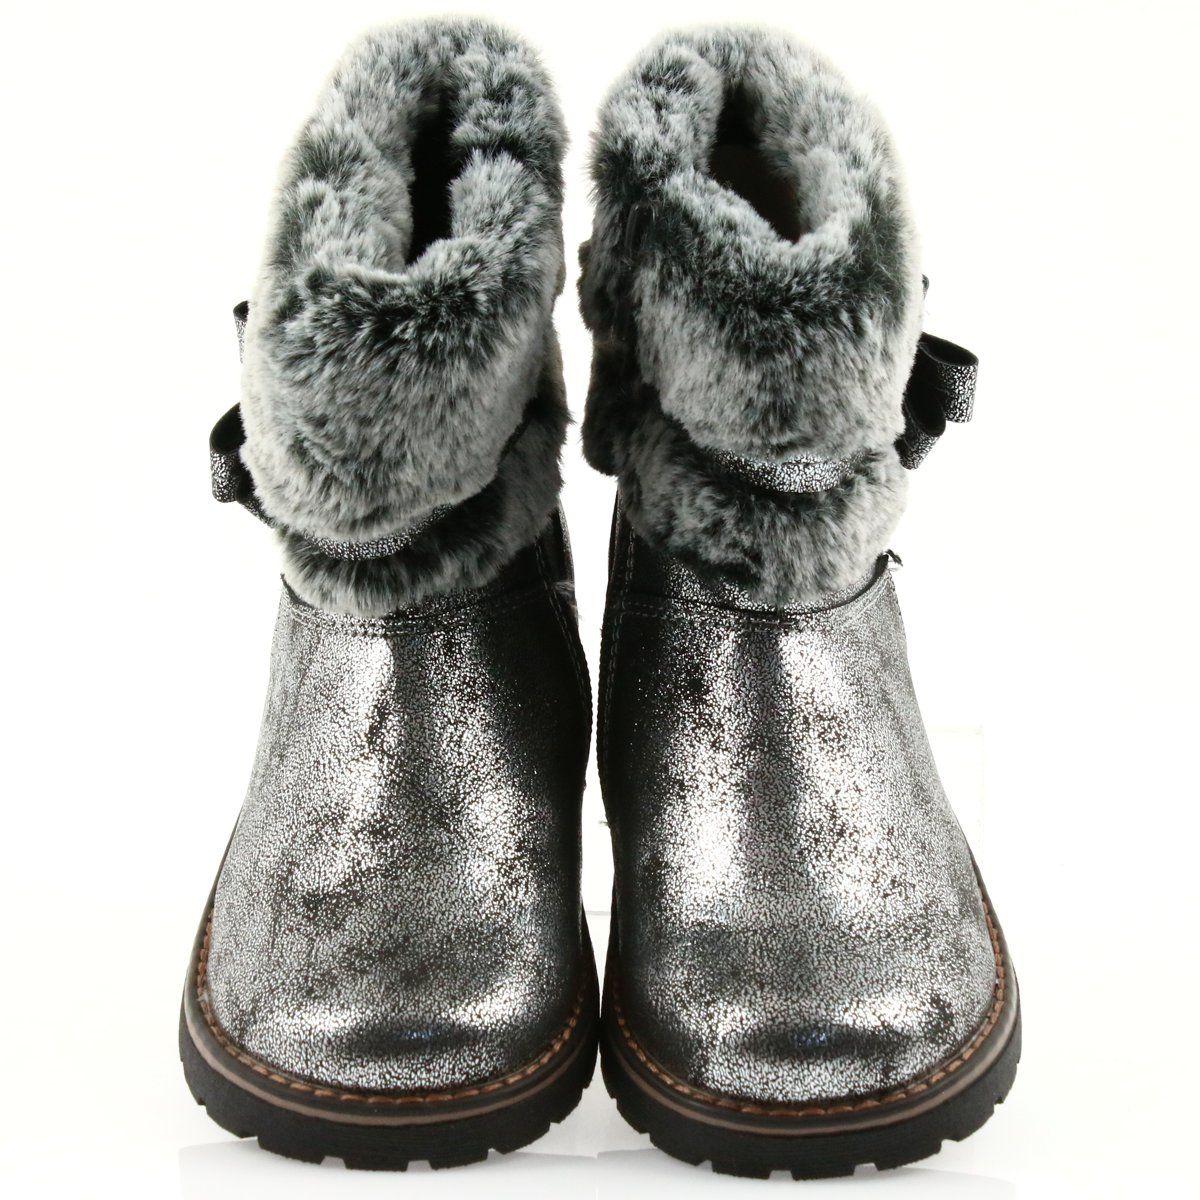 American Club American Kozaki Buty Zimowe Z Futerem 17042 Czarne Szare Boots Winter Boots Fur Boots